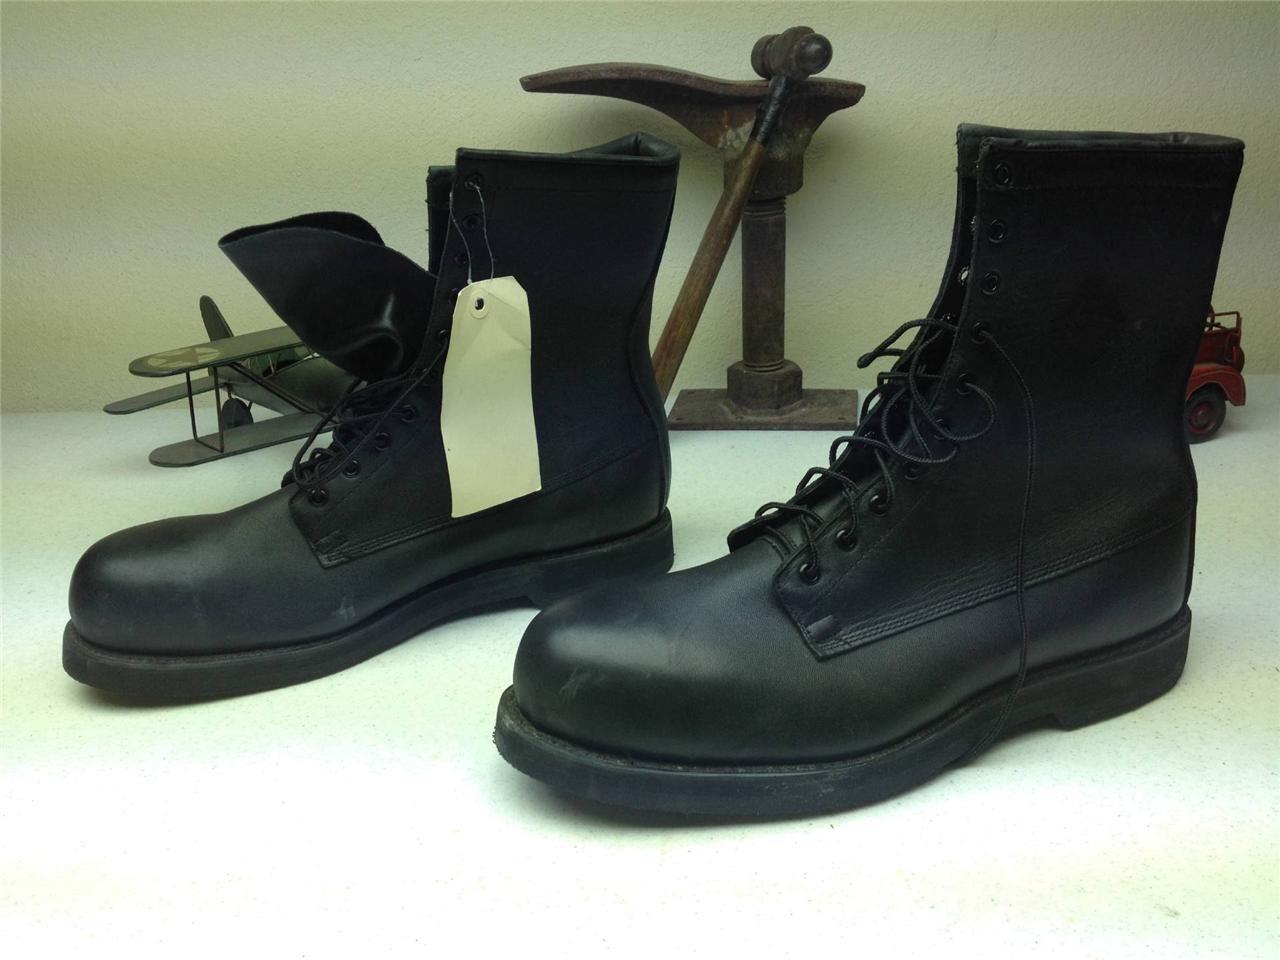 Negro Addison Puntera De Acero Militar De Combate Del Ejército Motocicleta lazada botas R